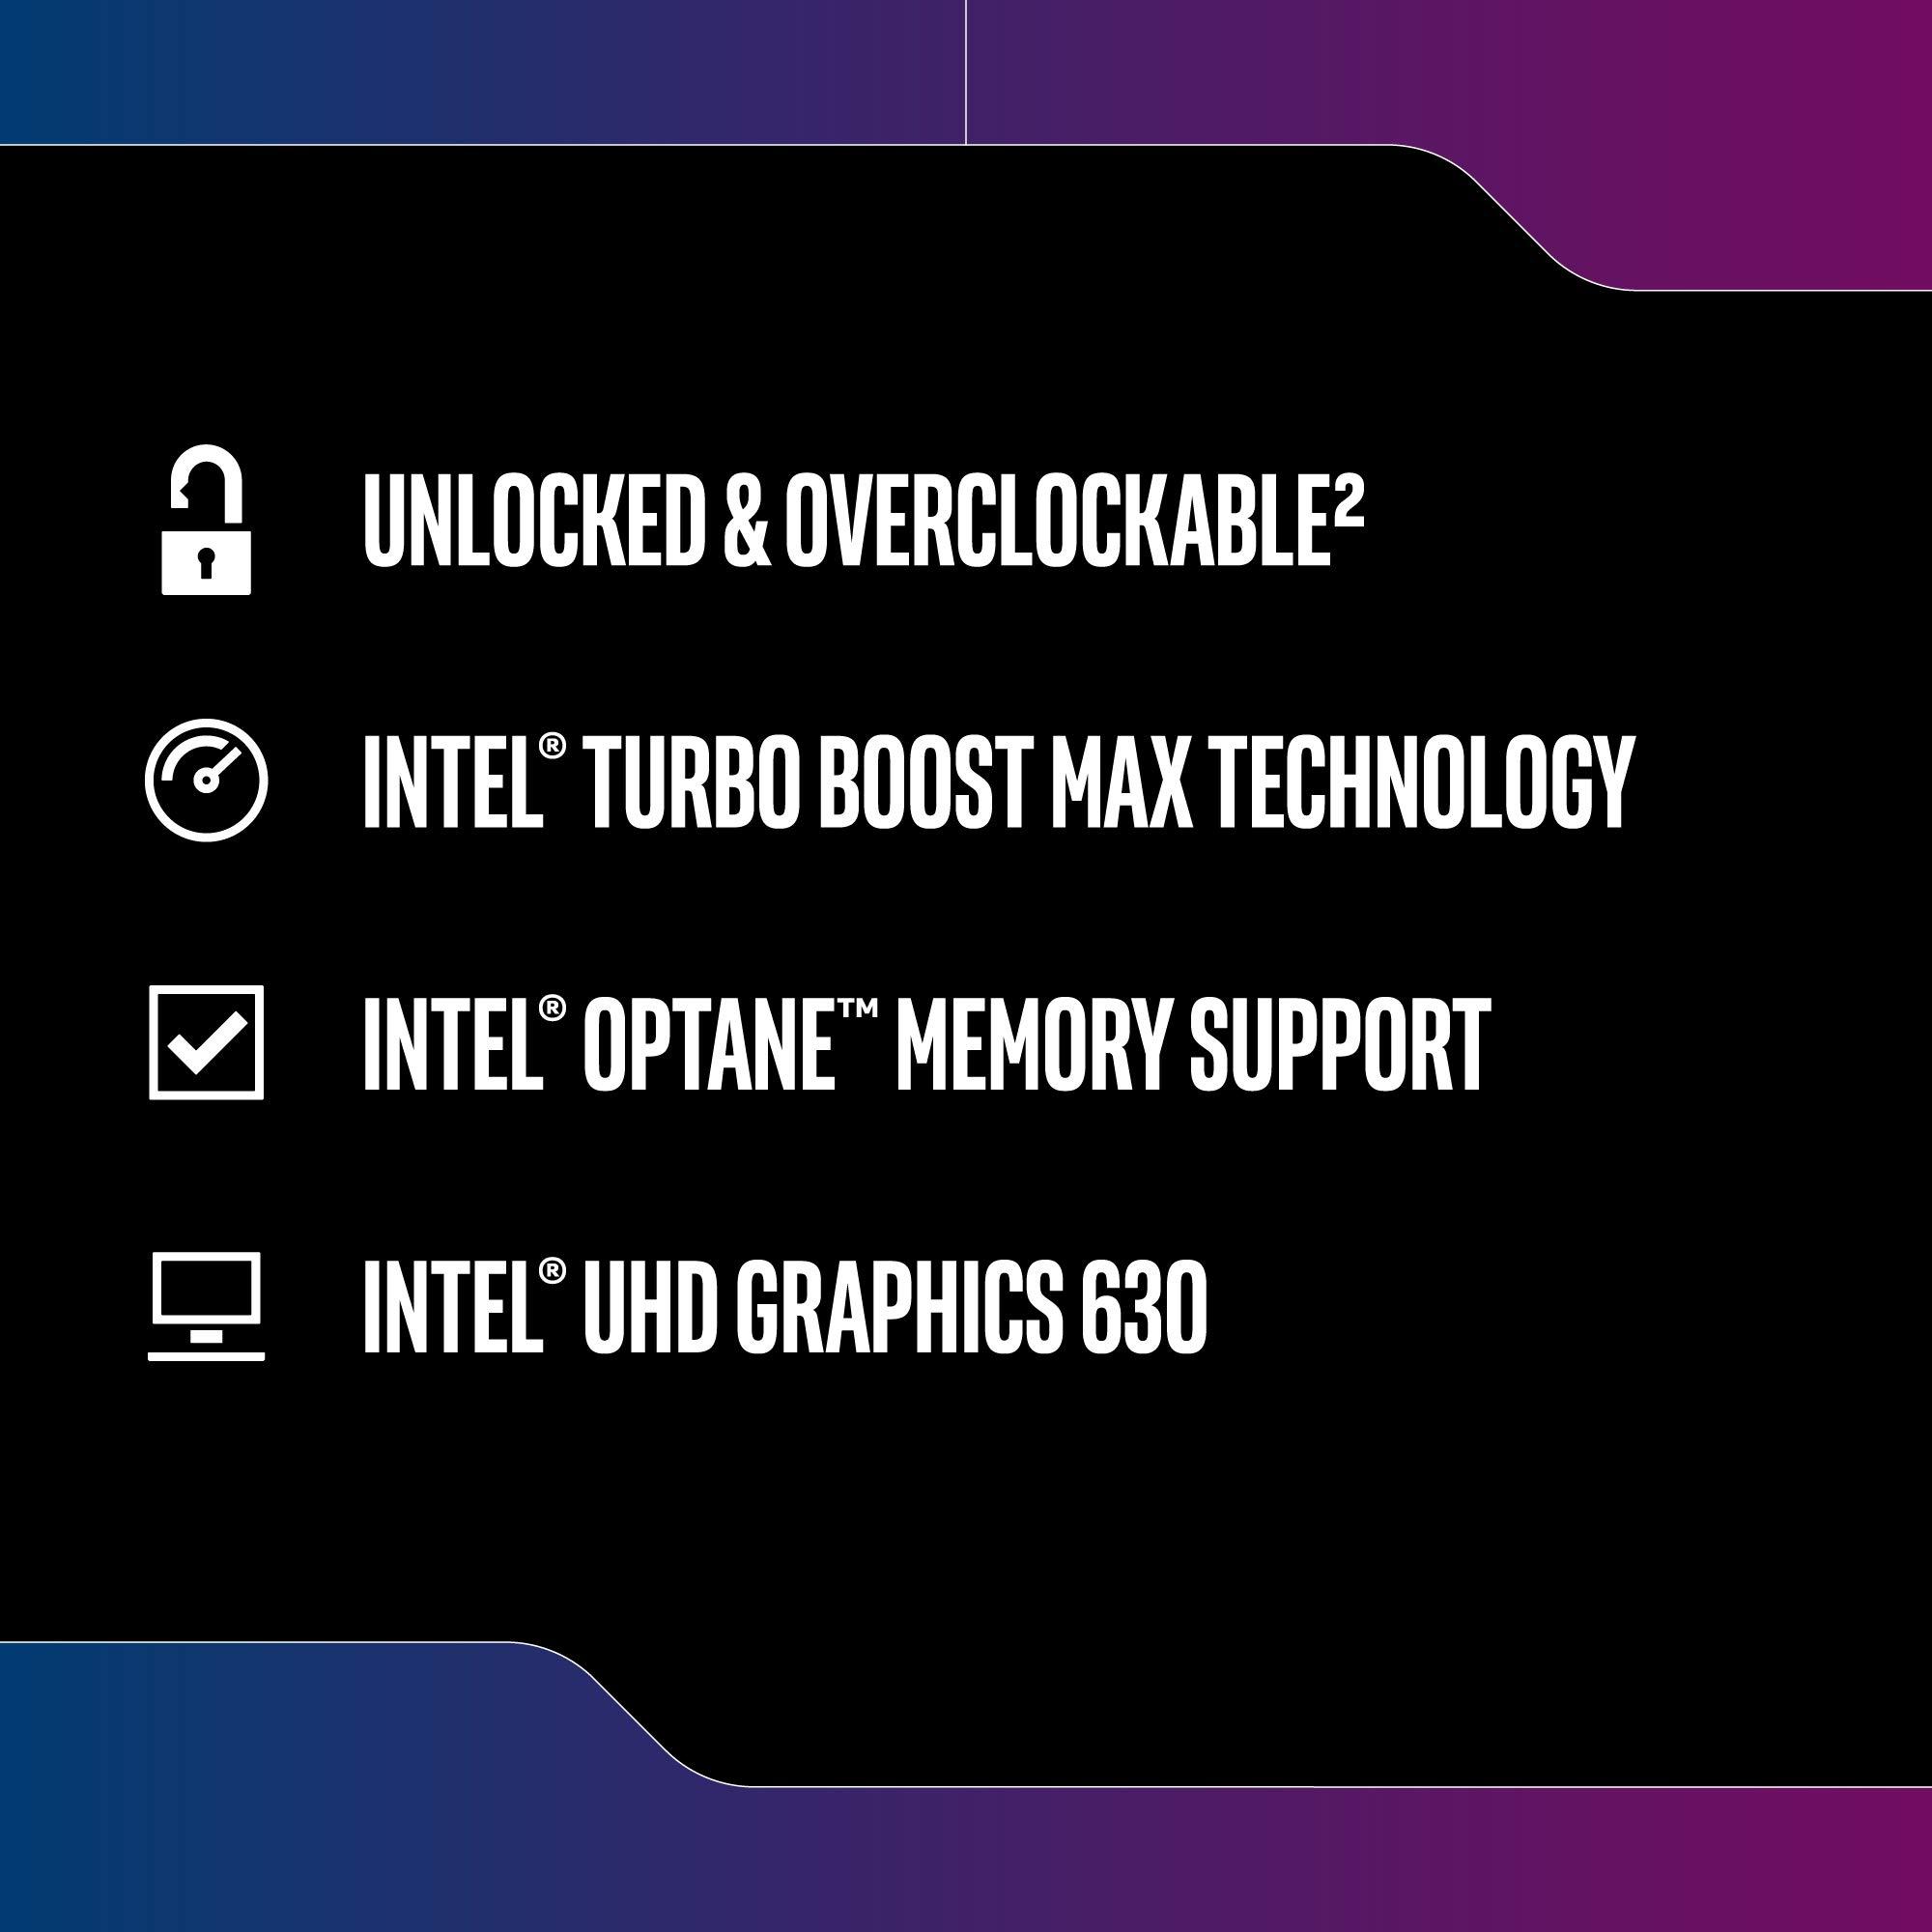 Intel Core i5-9600K Desktop Processor 6 Cores up to 4.6 GHz Turbo Unlocked LGA1151 300 Series 95W by Intel (Image #4)